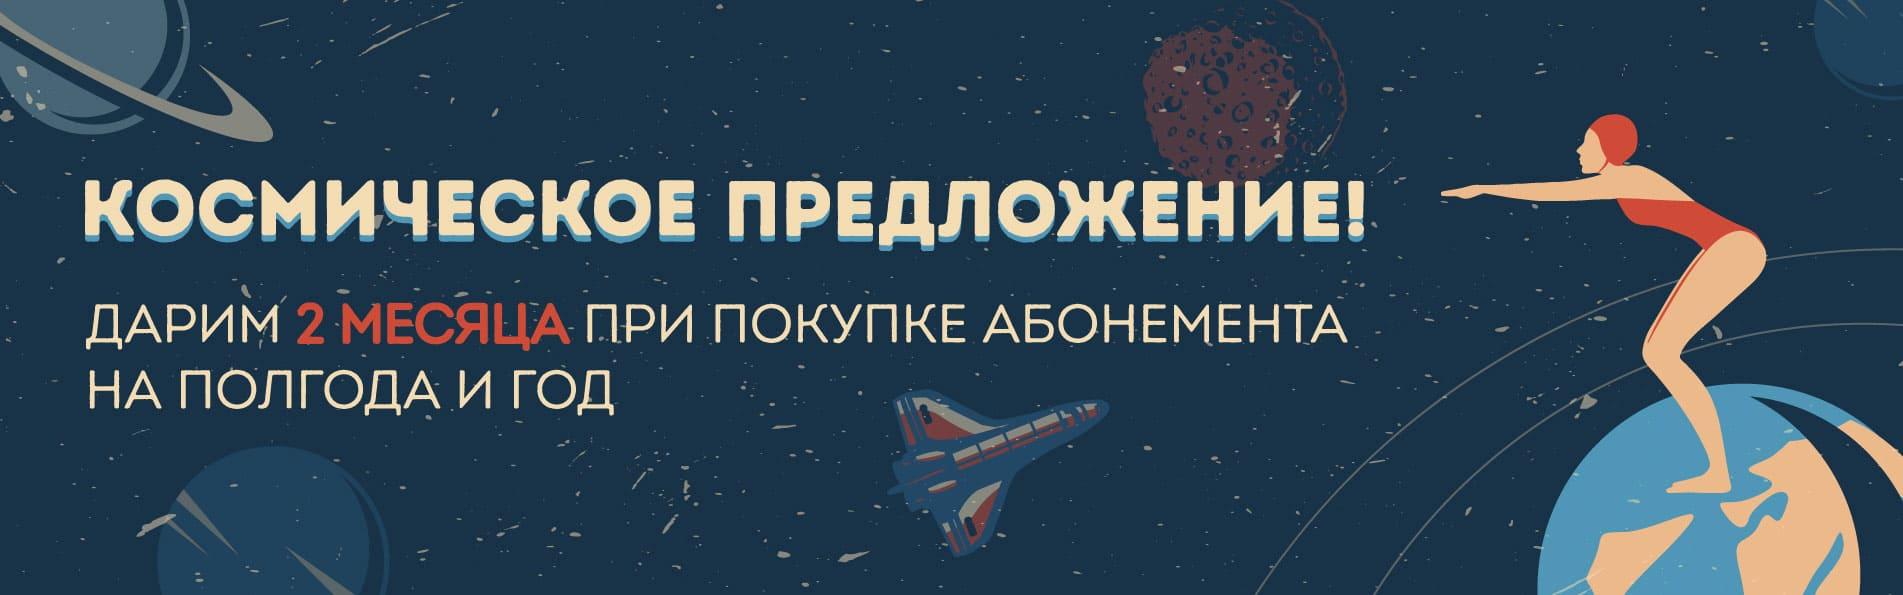 kosmos banner dekstop — Реасан